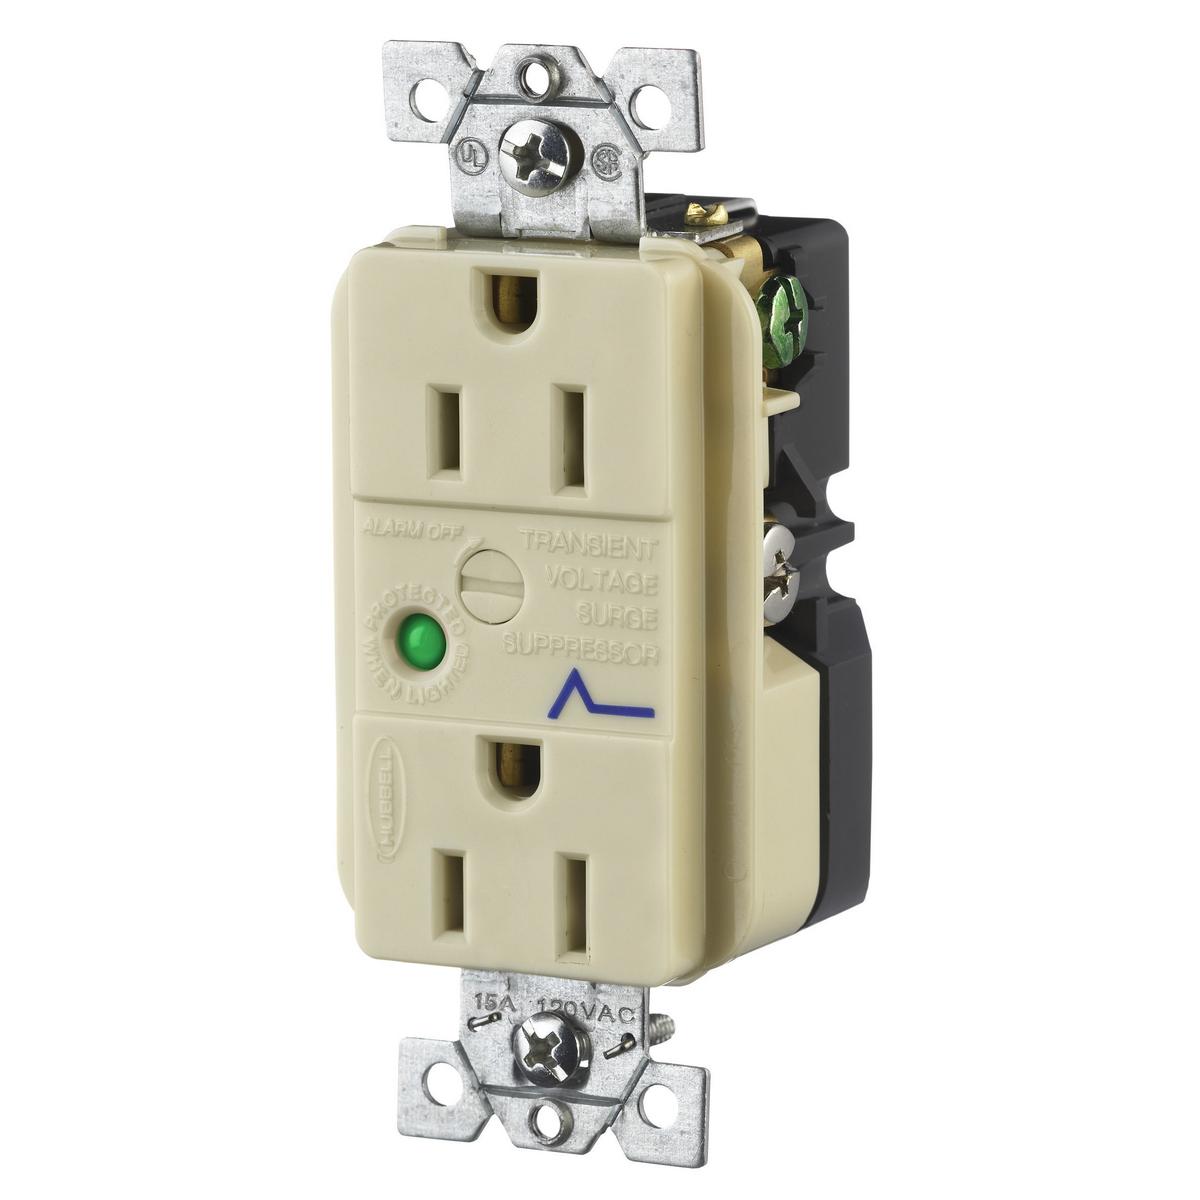 Hubbell HBL5262ISA 15 Amp 125 Volt 2-Pole 3-Wire NEMA 5-15R Ivory Duplex Surge Suppression Receptacle